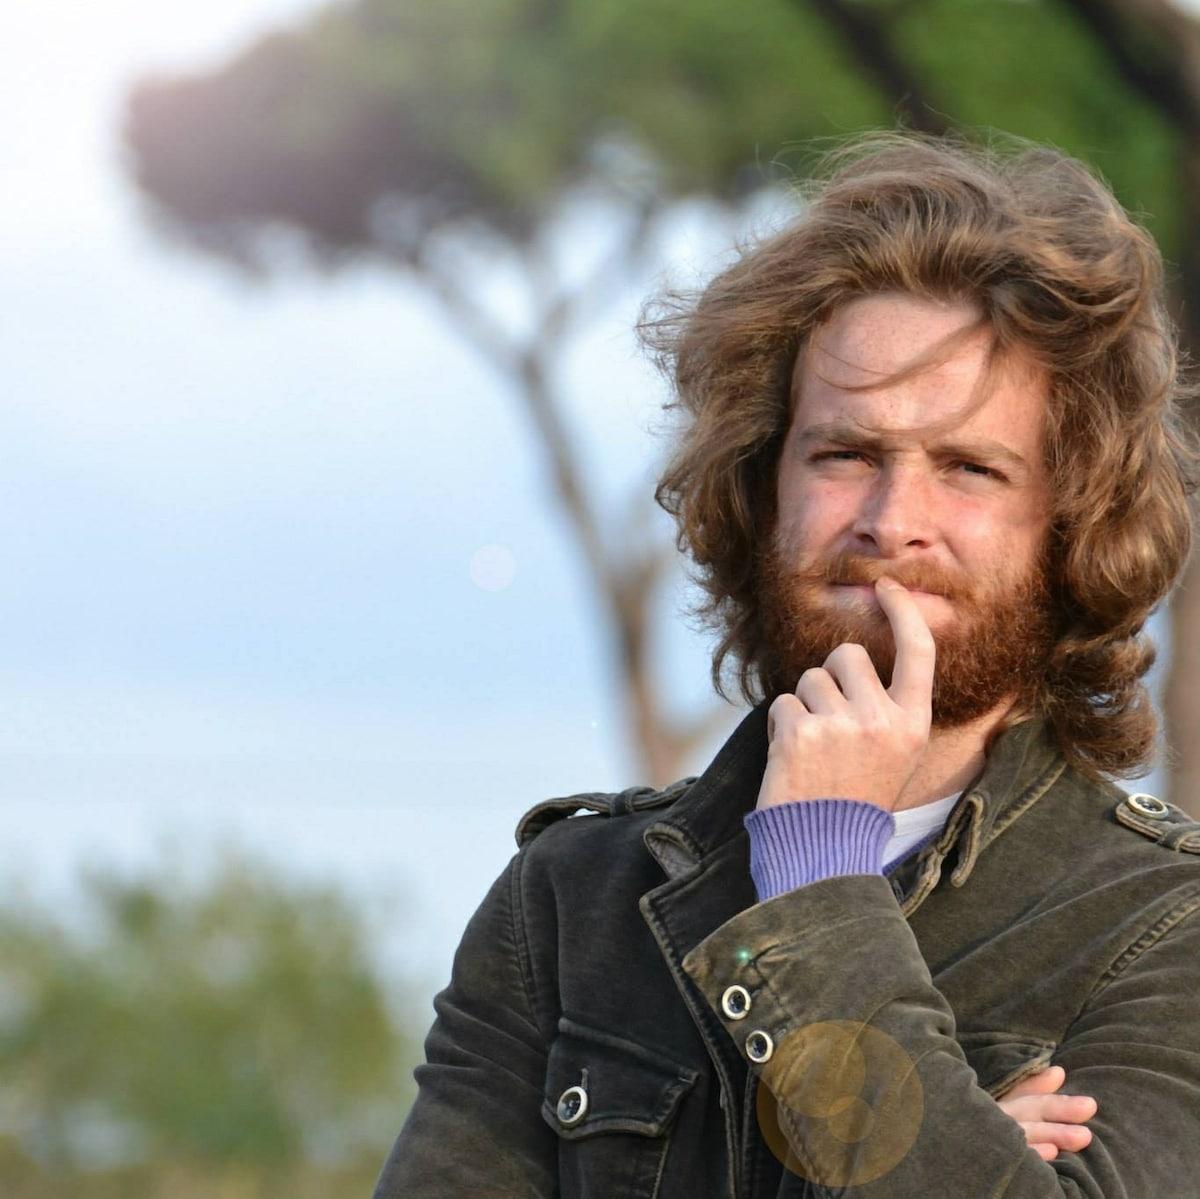 Lorenzo from Cagnano Amiterno